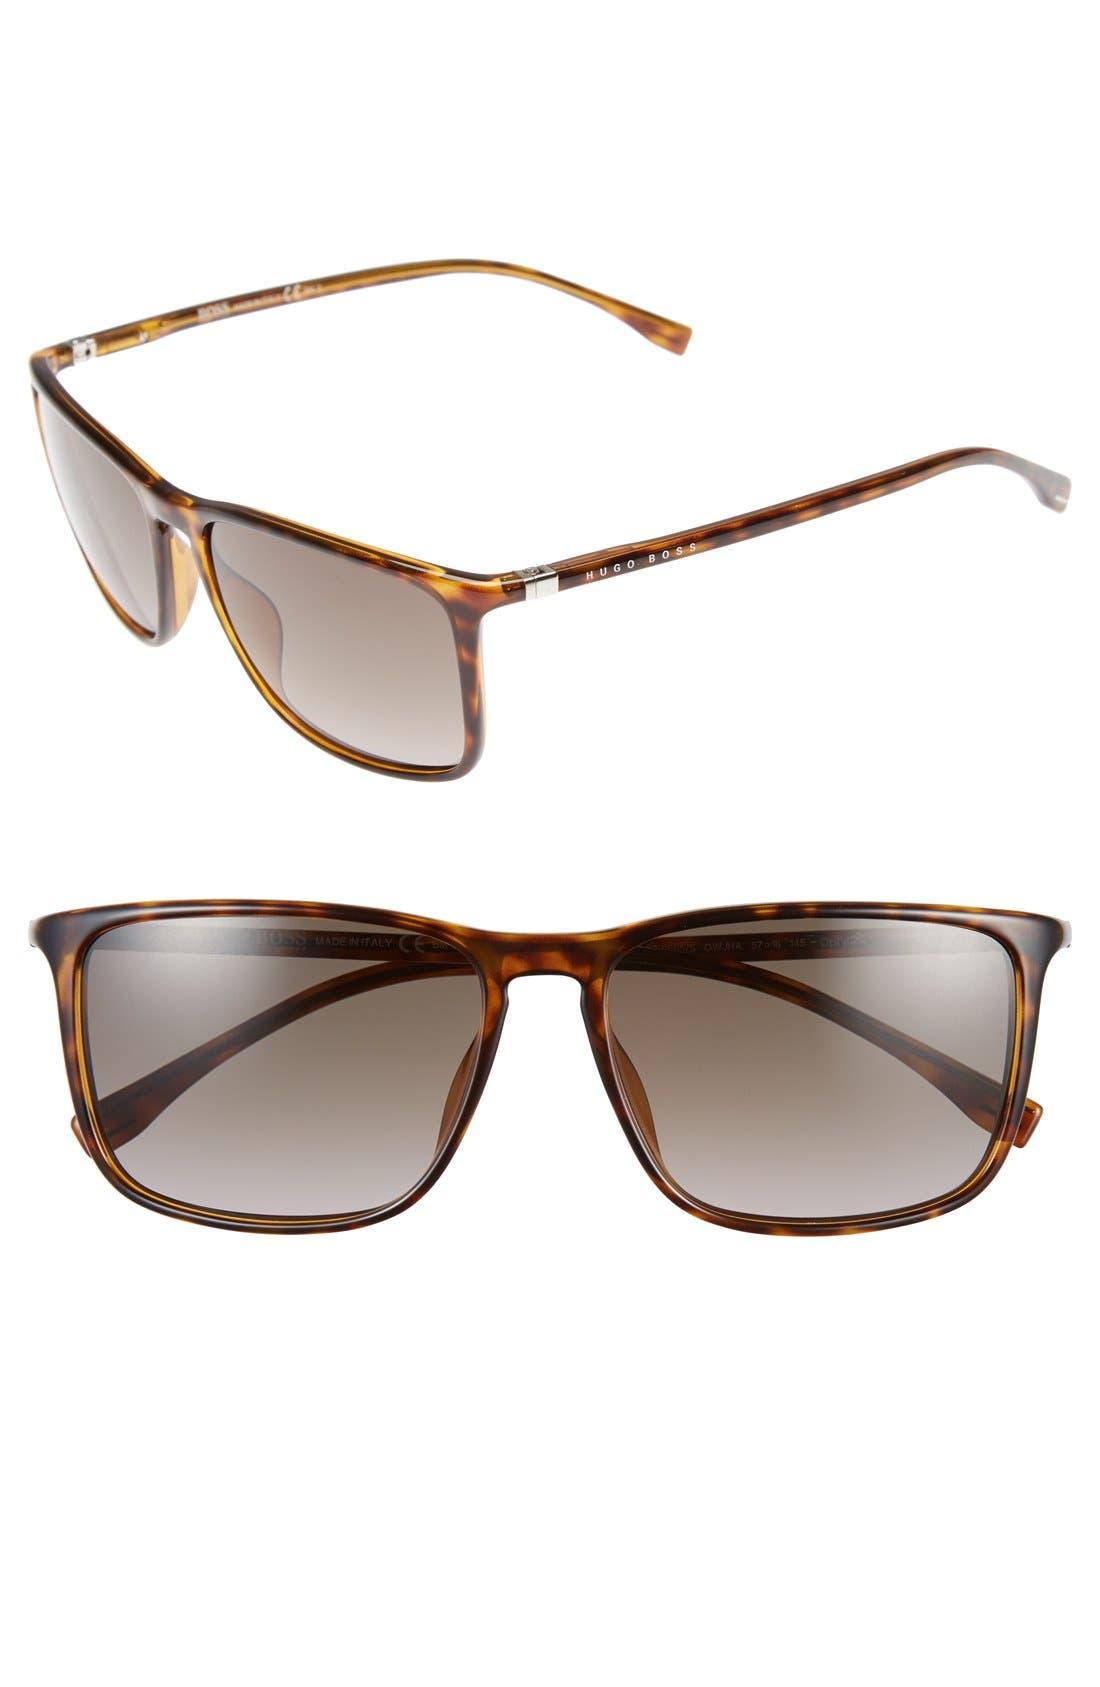 57mm Retro Sunglasses,                             Main thumbnail 1, color,                             210